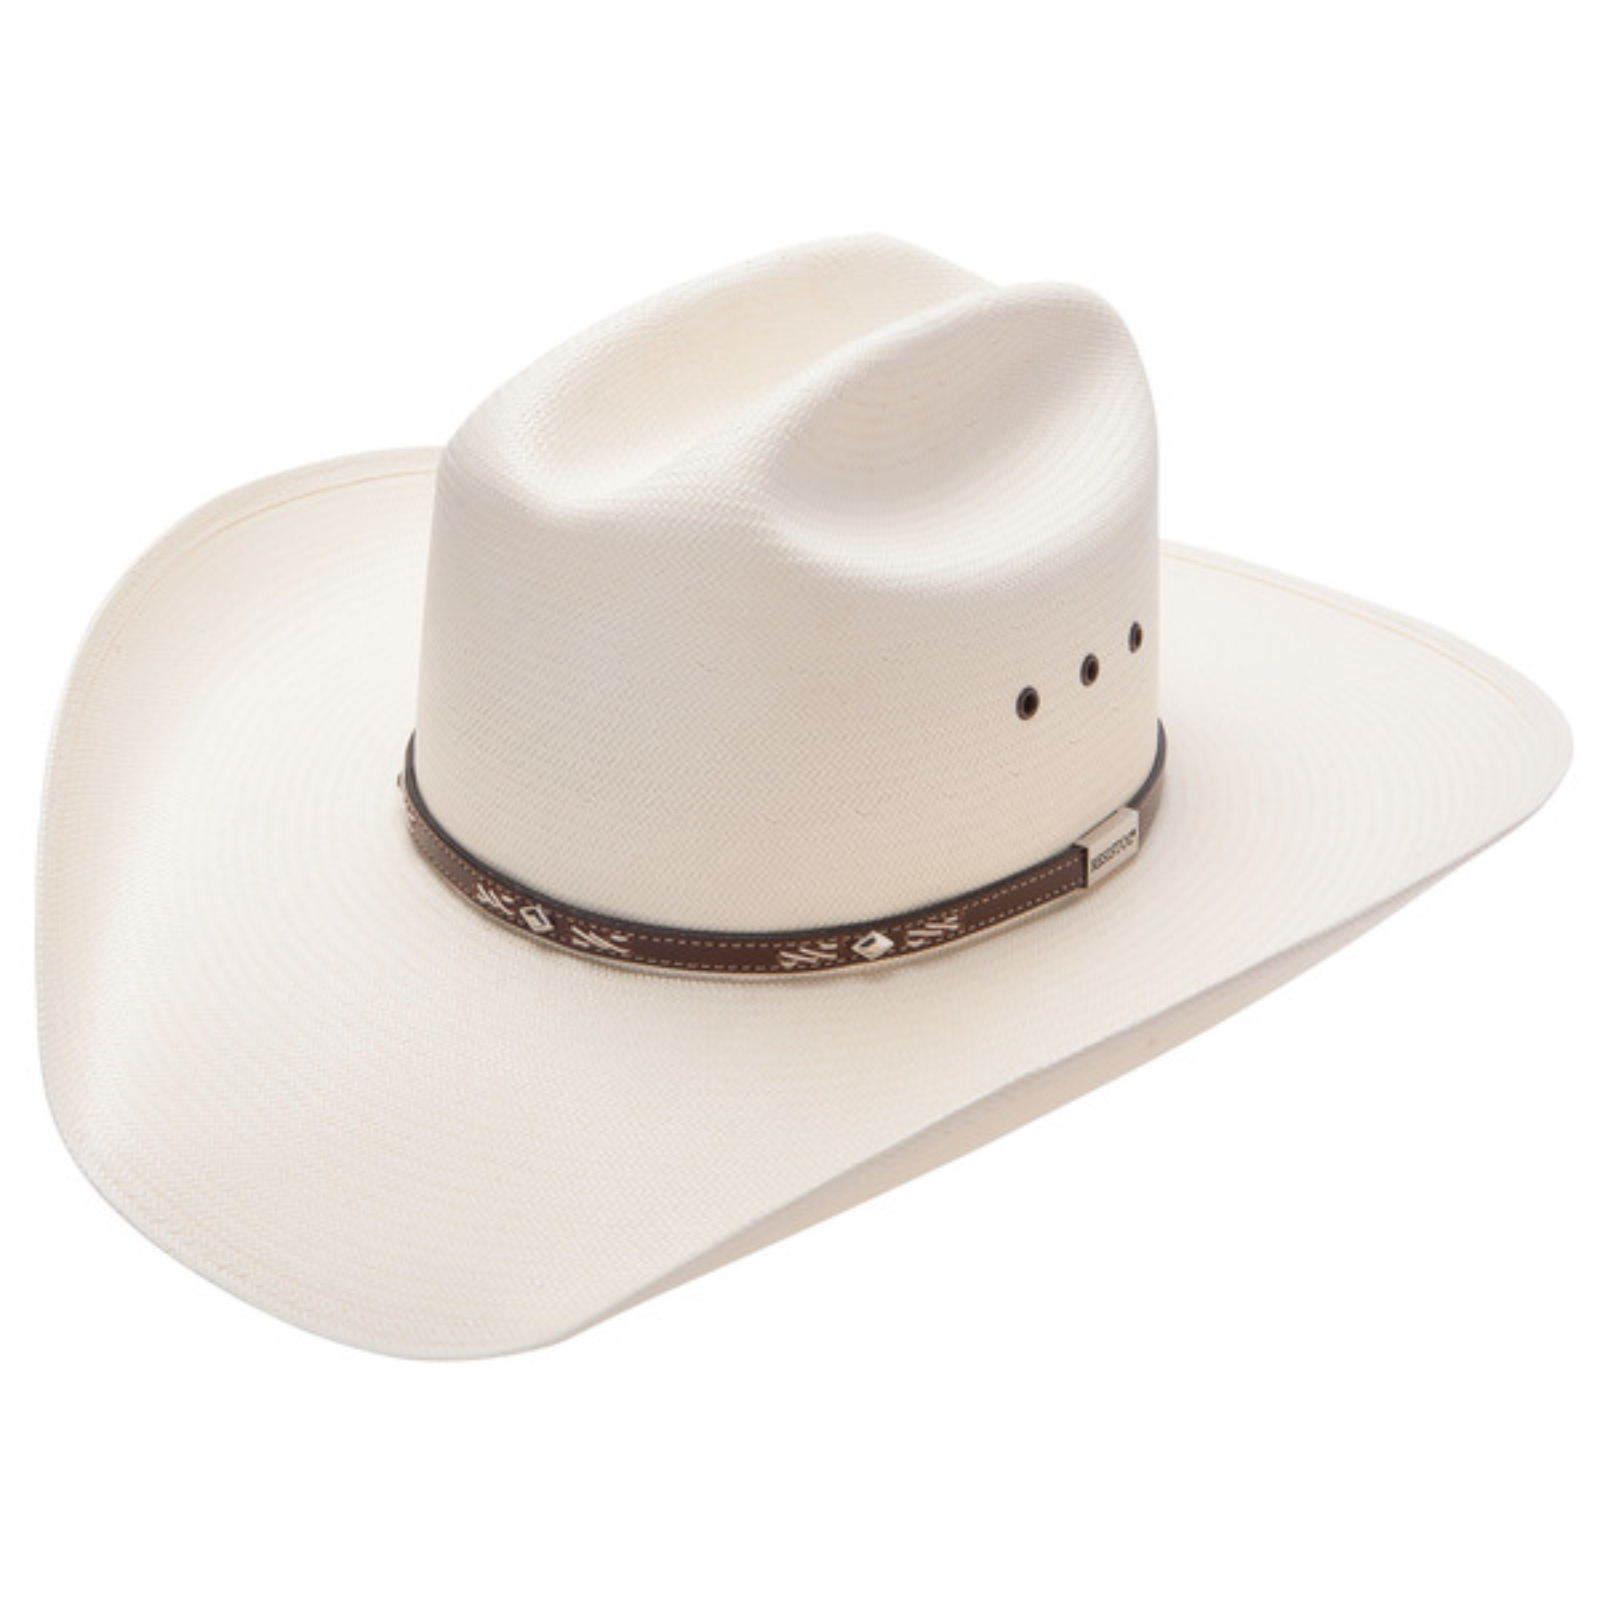 a69760e5 RESISTOL GEORGE STRAIT LAMBERT 10X STRAW COWBOY WESTERN HAT